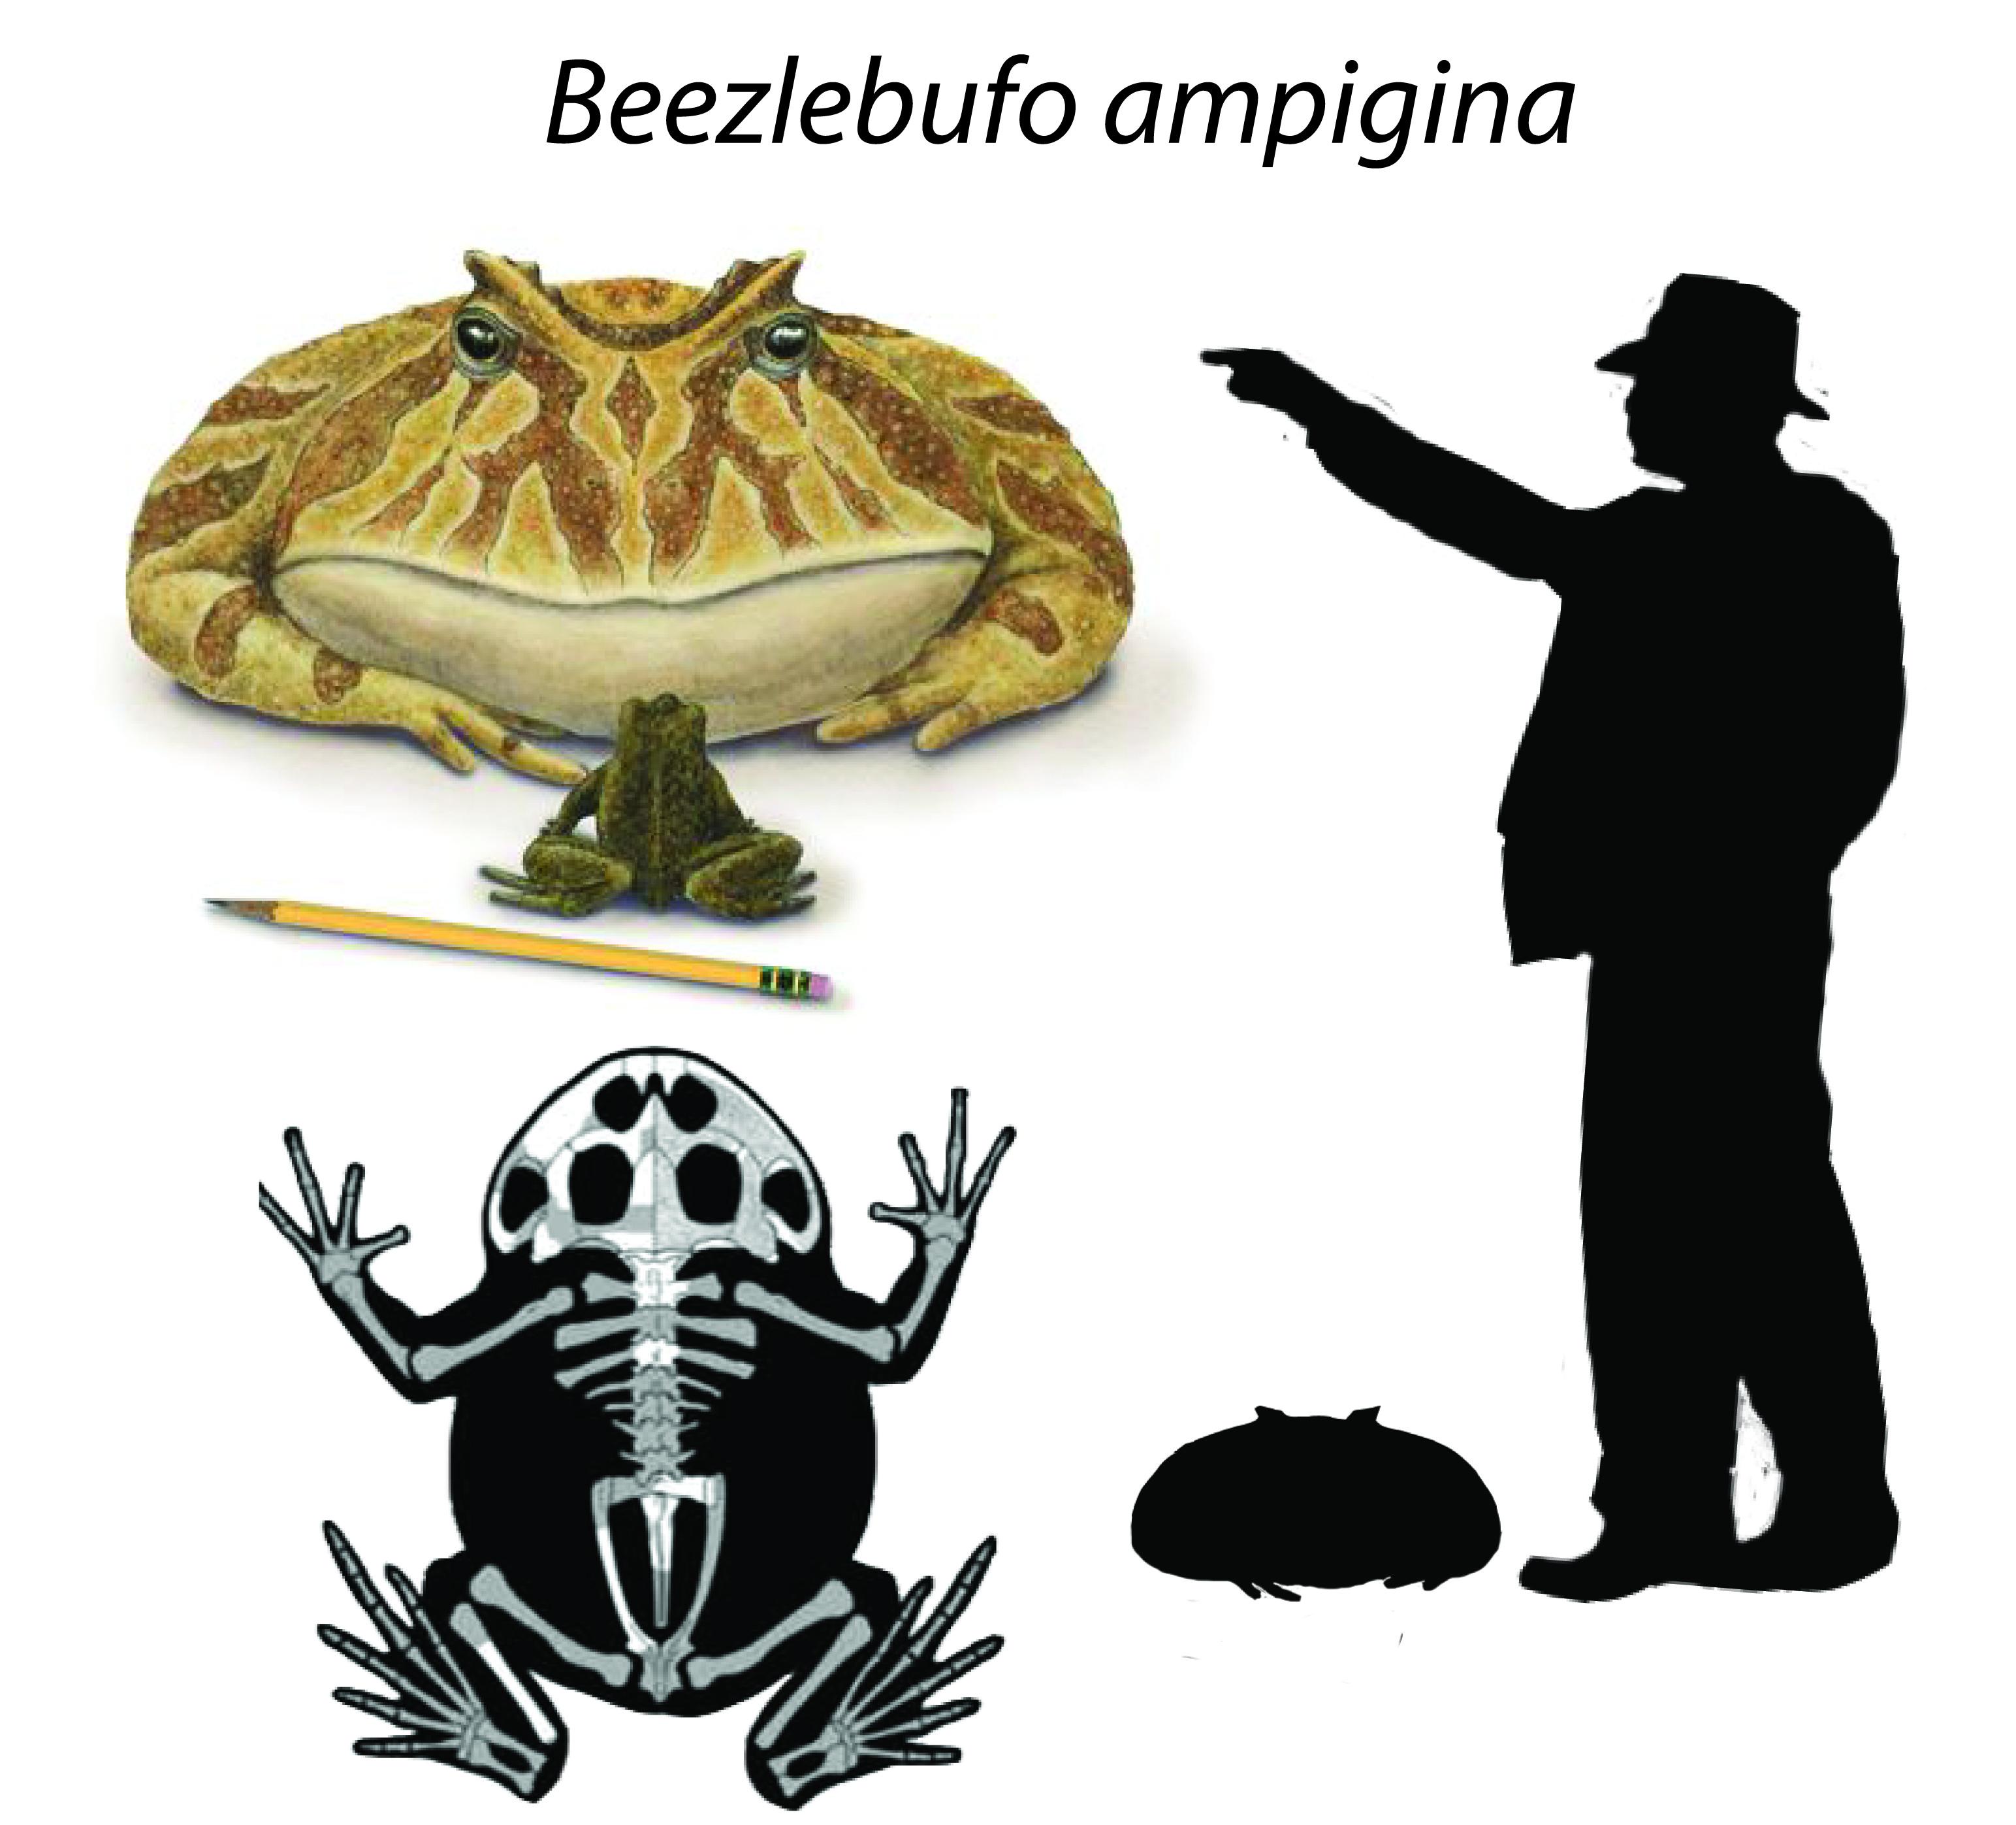 Beezlebufo ampigina